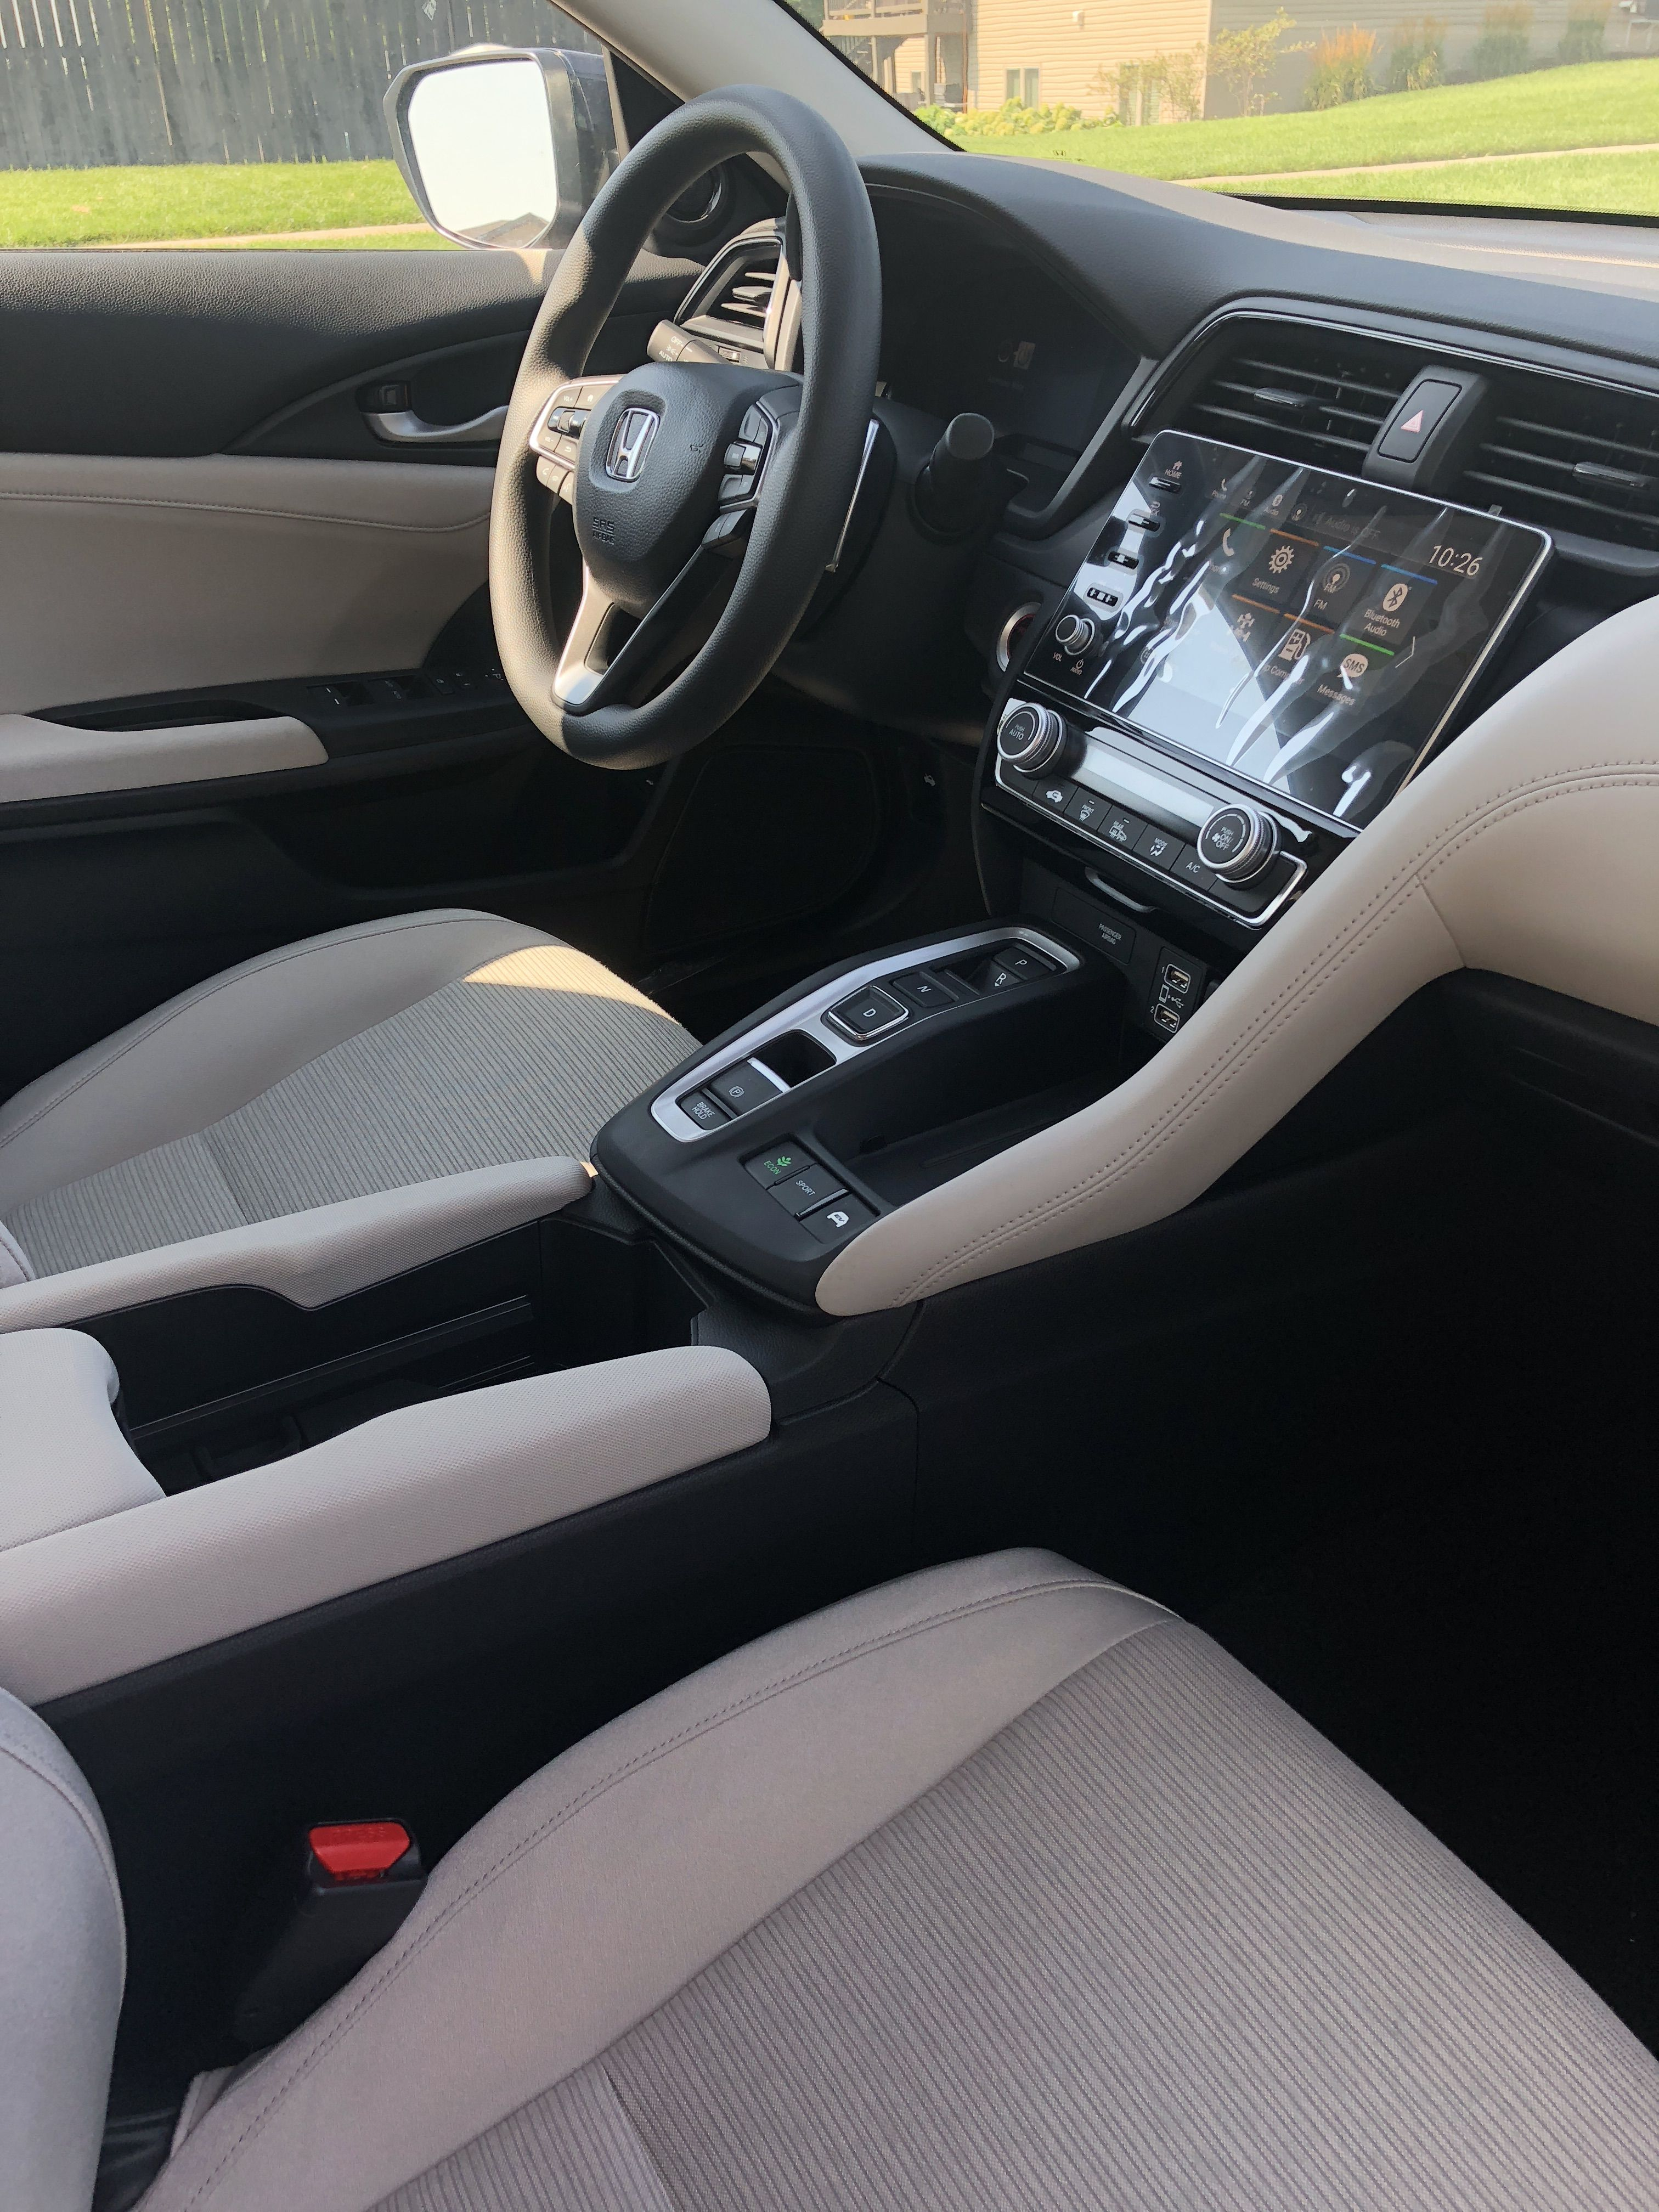 Honda Insight Honda Insight New Honda Honda